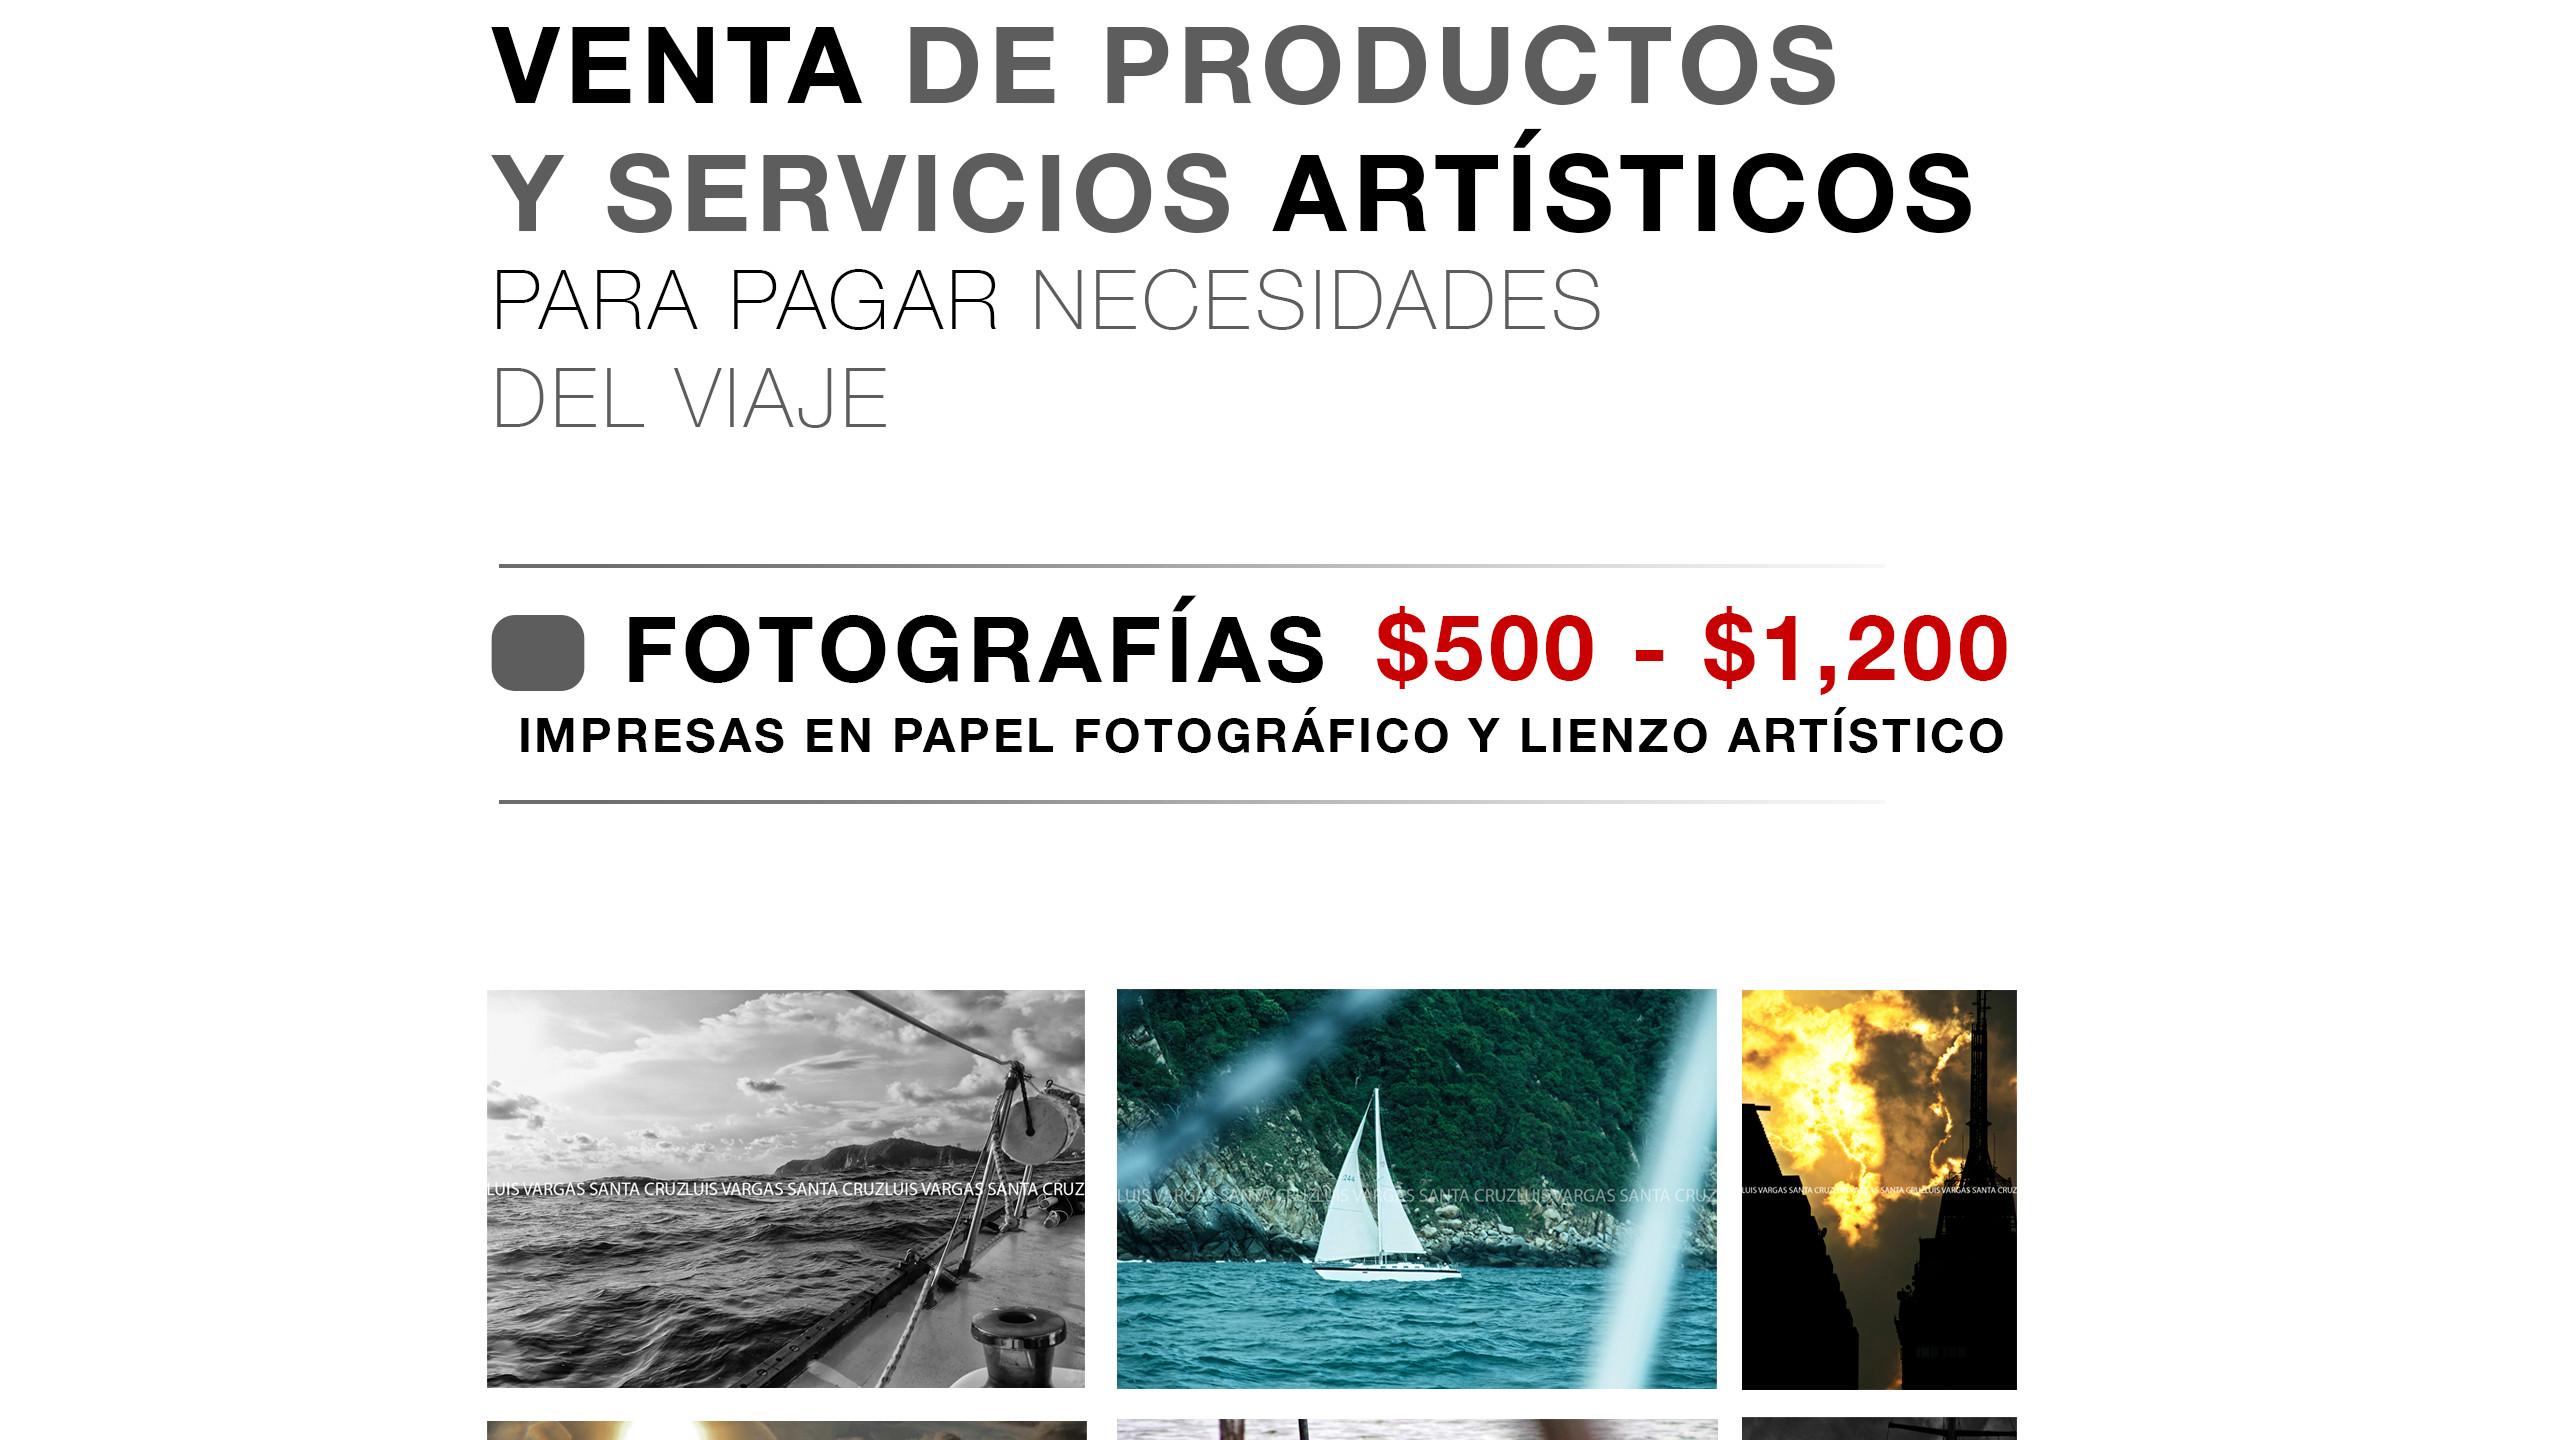 Venta_ruta_vorágine_Fotos